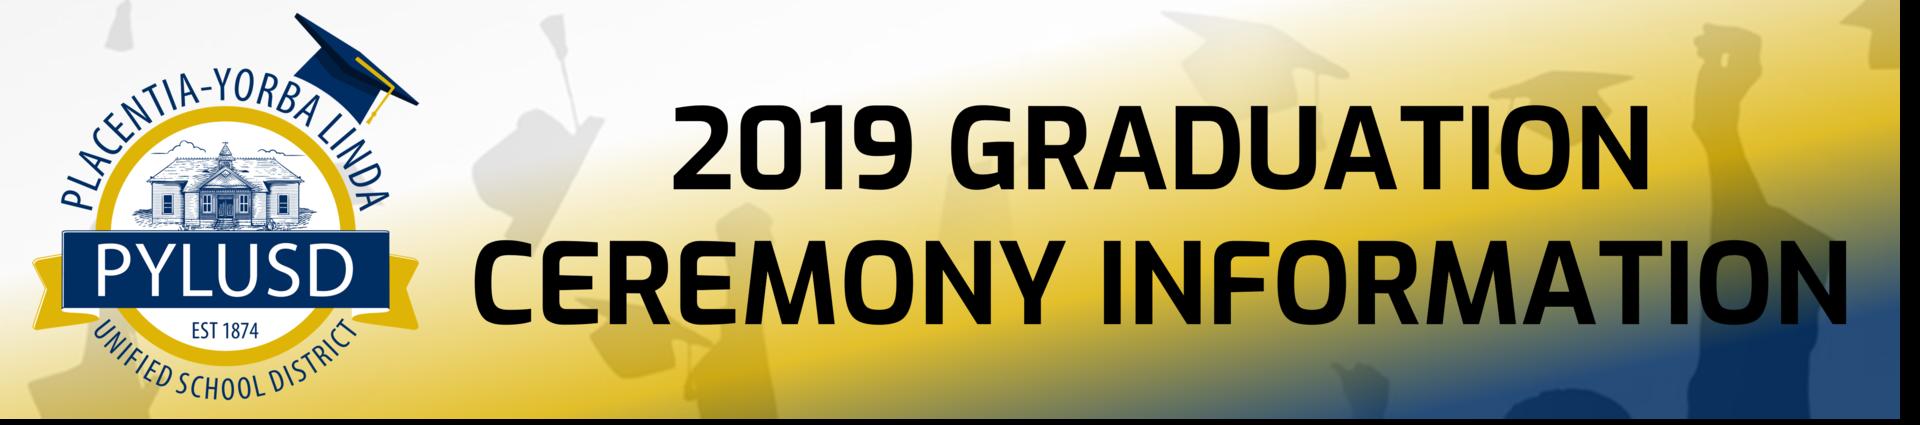 2019 Graduation Ceremony Information on behalf of PYLUSD.